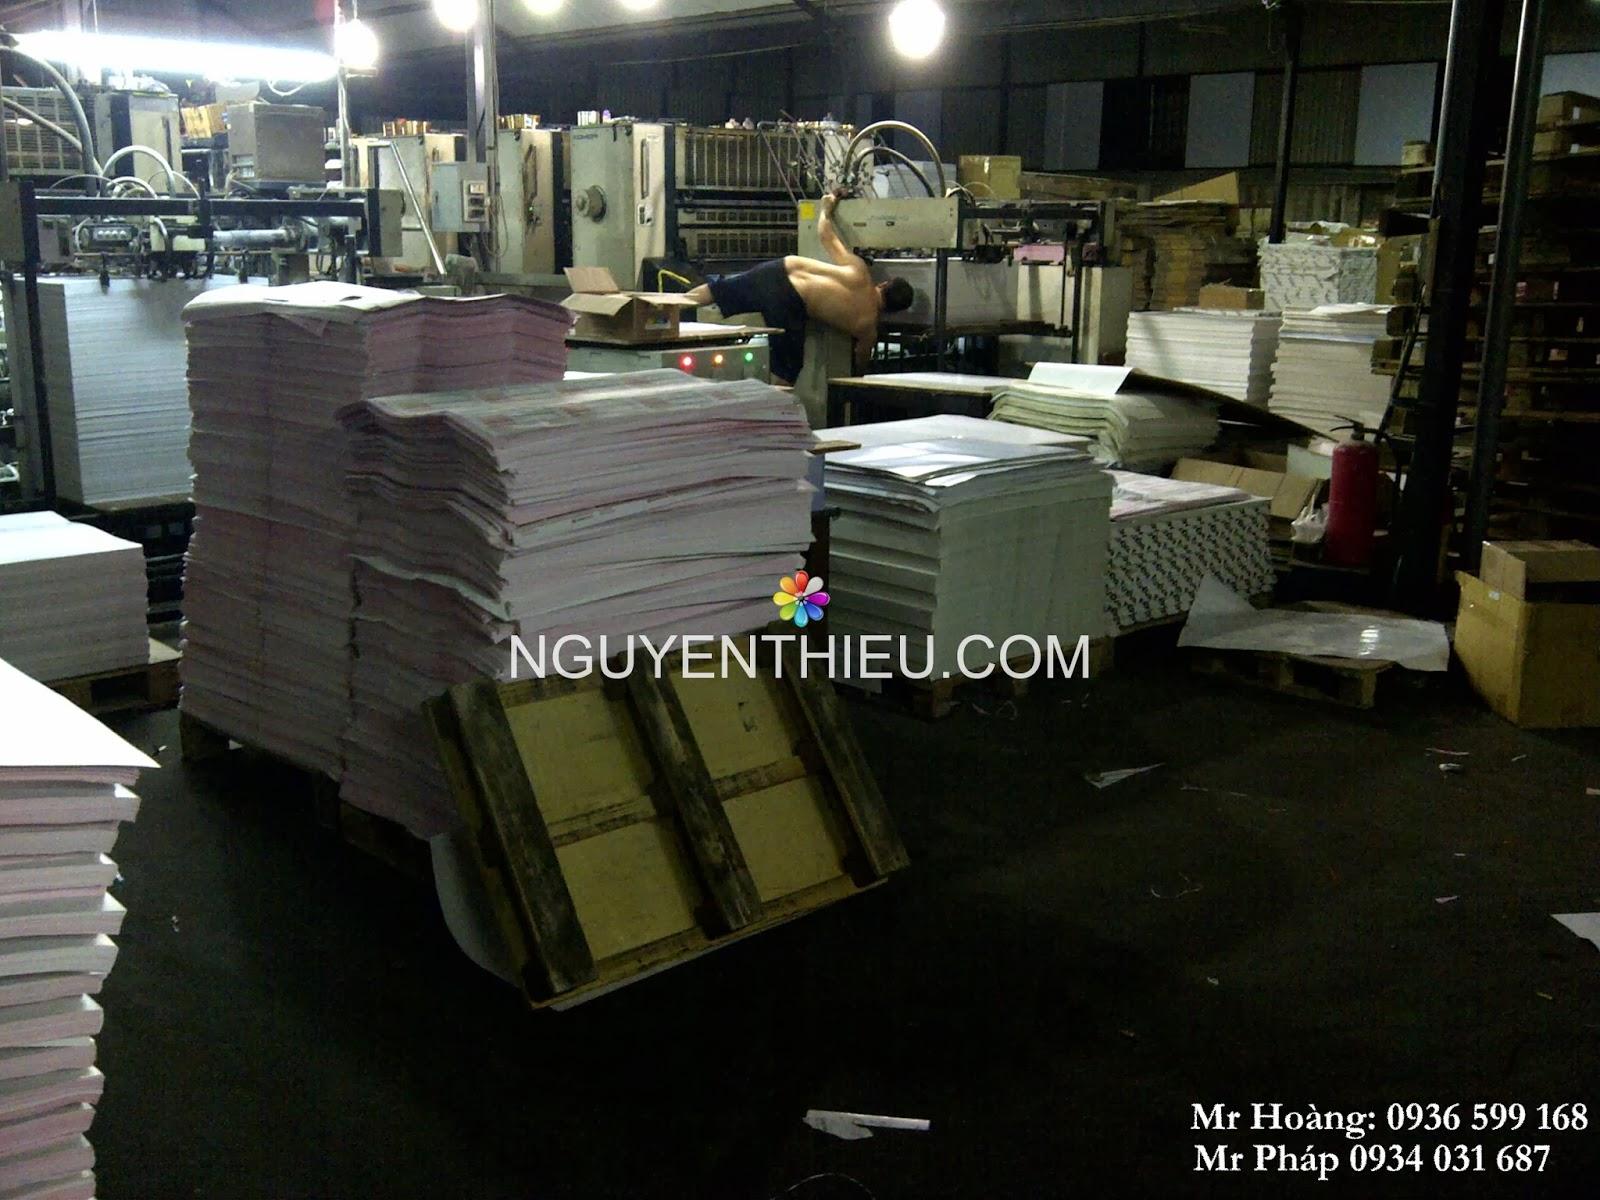 xưởng in ấn, in ấn sổ tay